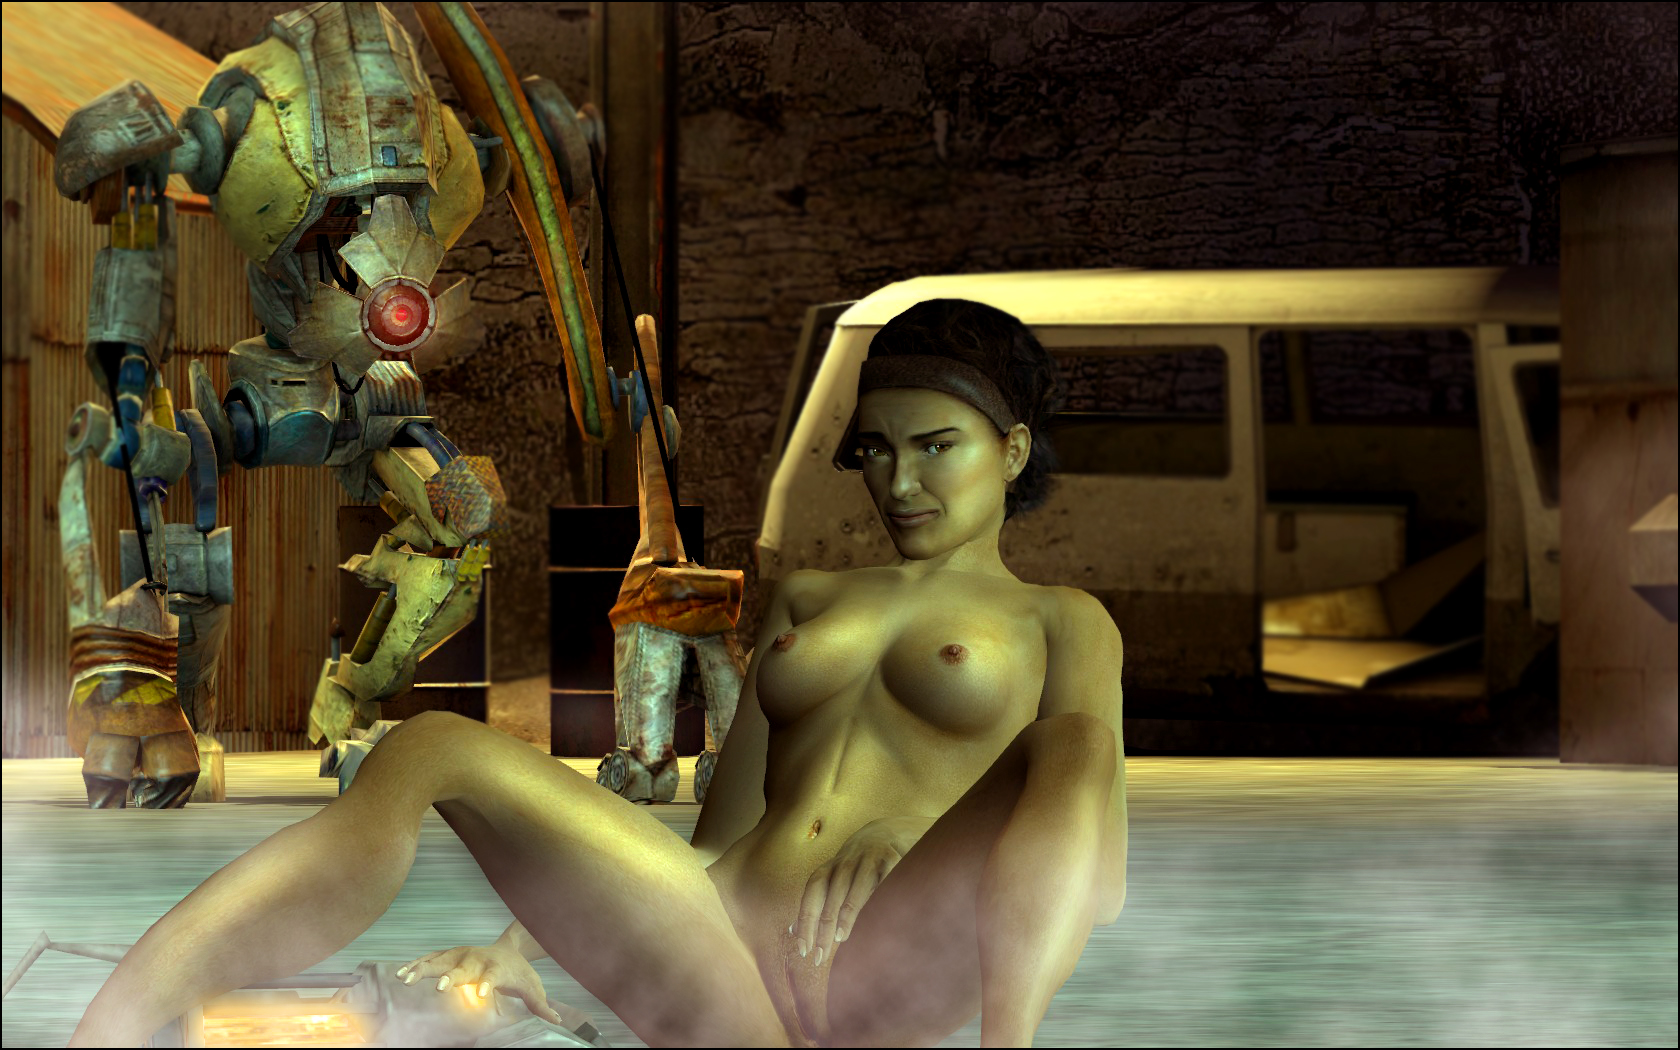 female fallout mod nude 4 Stamina wheel breath of the wild